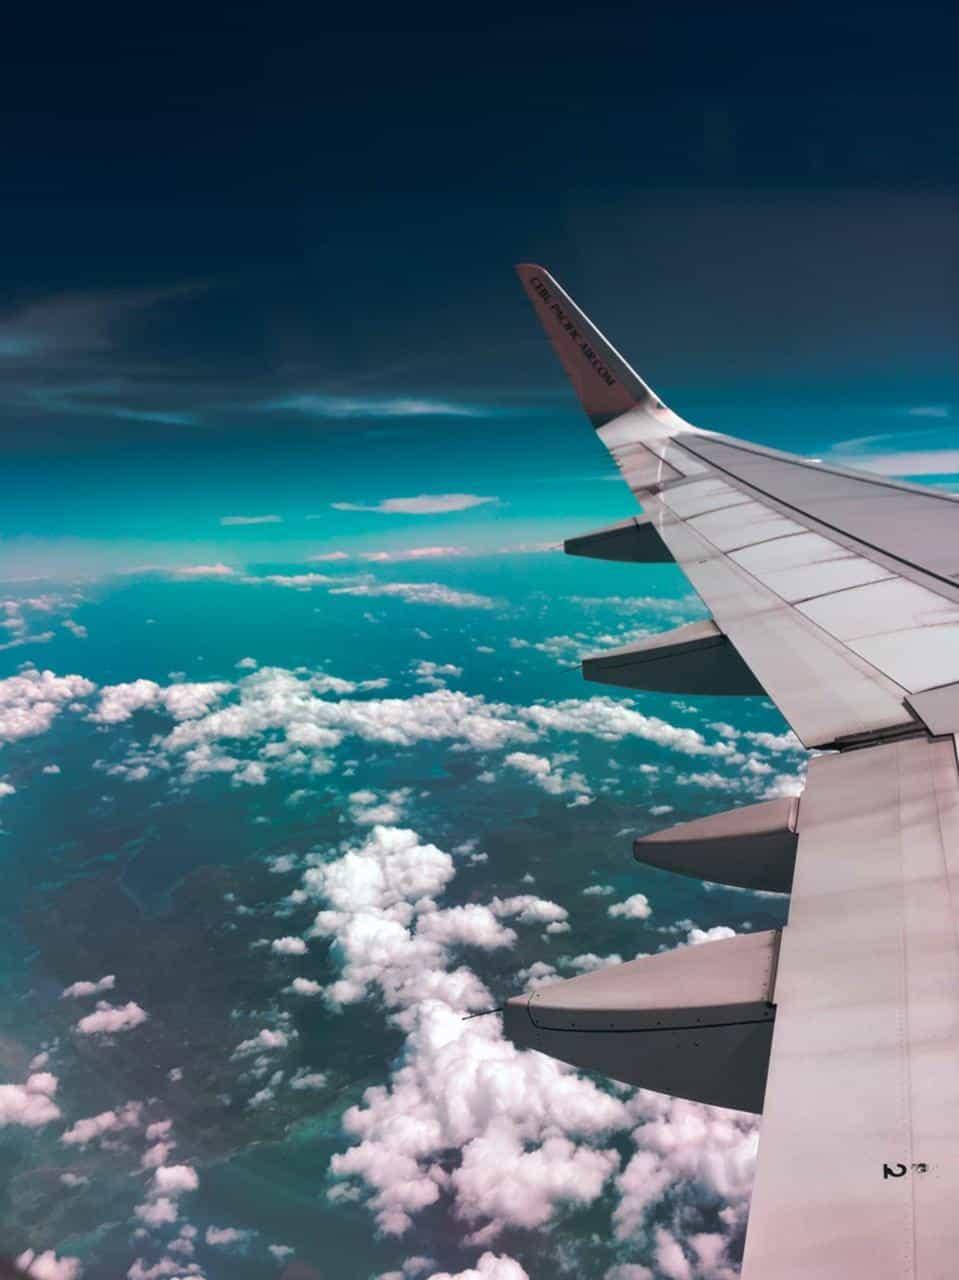 wizz air евтини самолетни билети 1 - Wizz air евтини самолетни билети